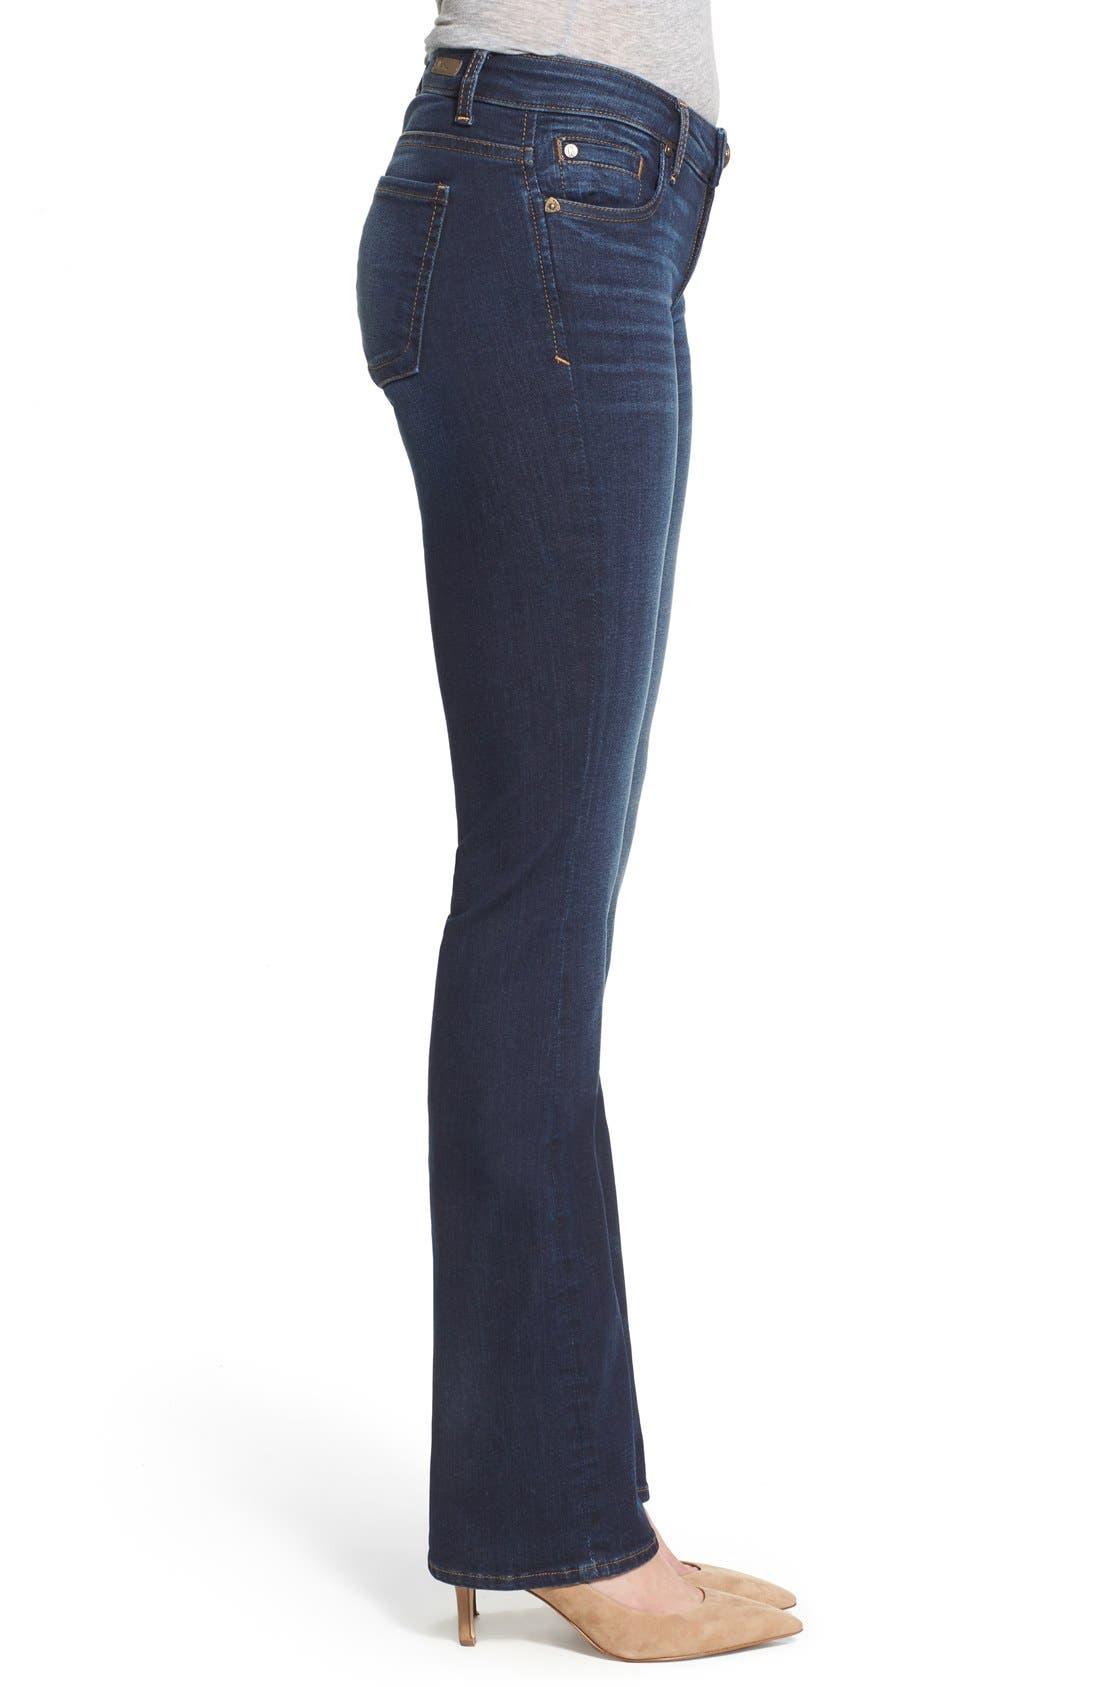 'Natalie' Stretch Bootleg Jeans,                             Alternate thumbnail 3, color,                             401